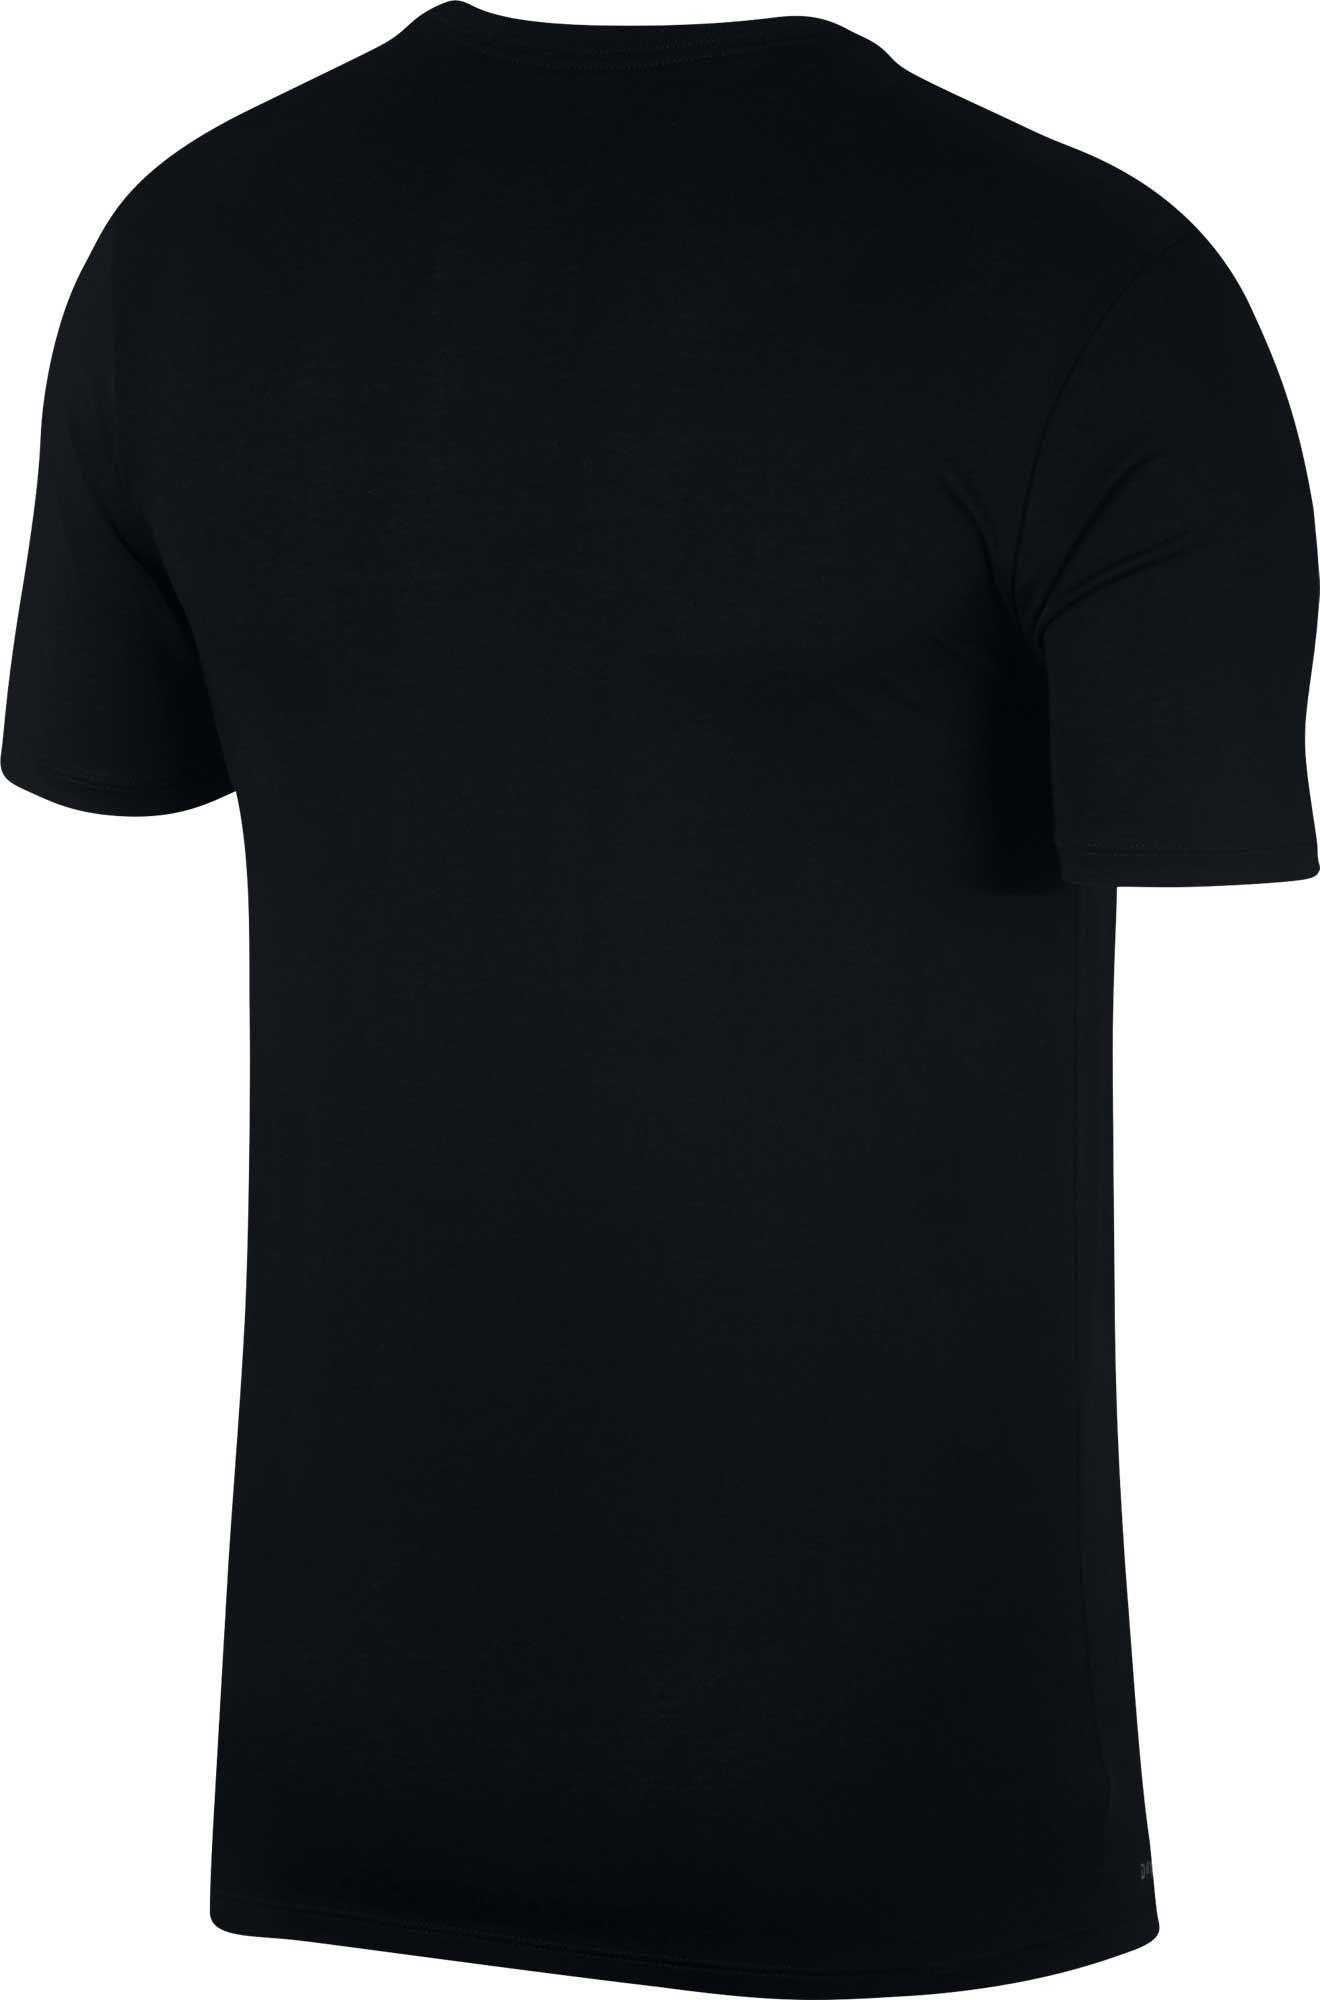 35f5bf92f1587d Lyst - Nike Jordan Flight Mashup Graphic Tee in Black for Men